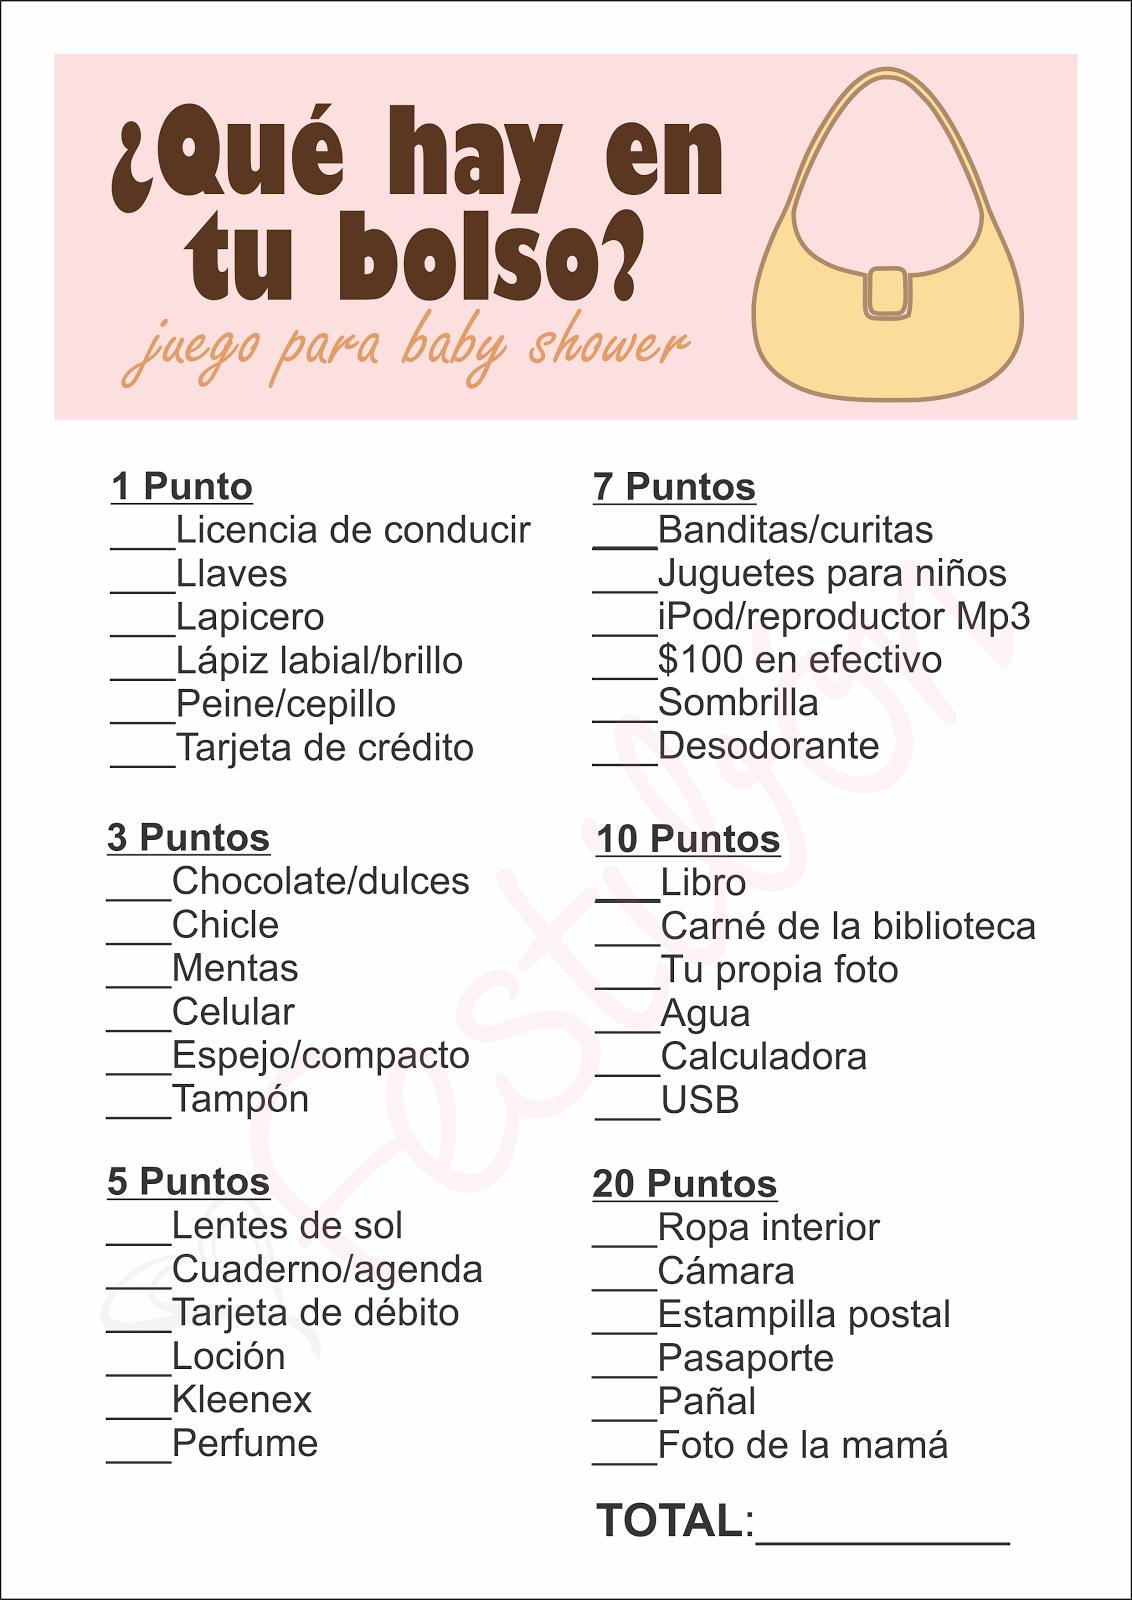 Juegos De Baby Shower En Espanol Gratis 9912232 Angrybirdsriogame Info